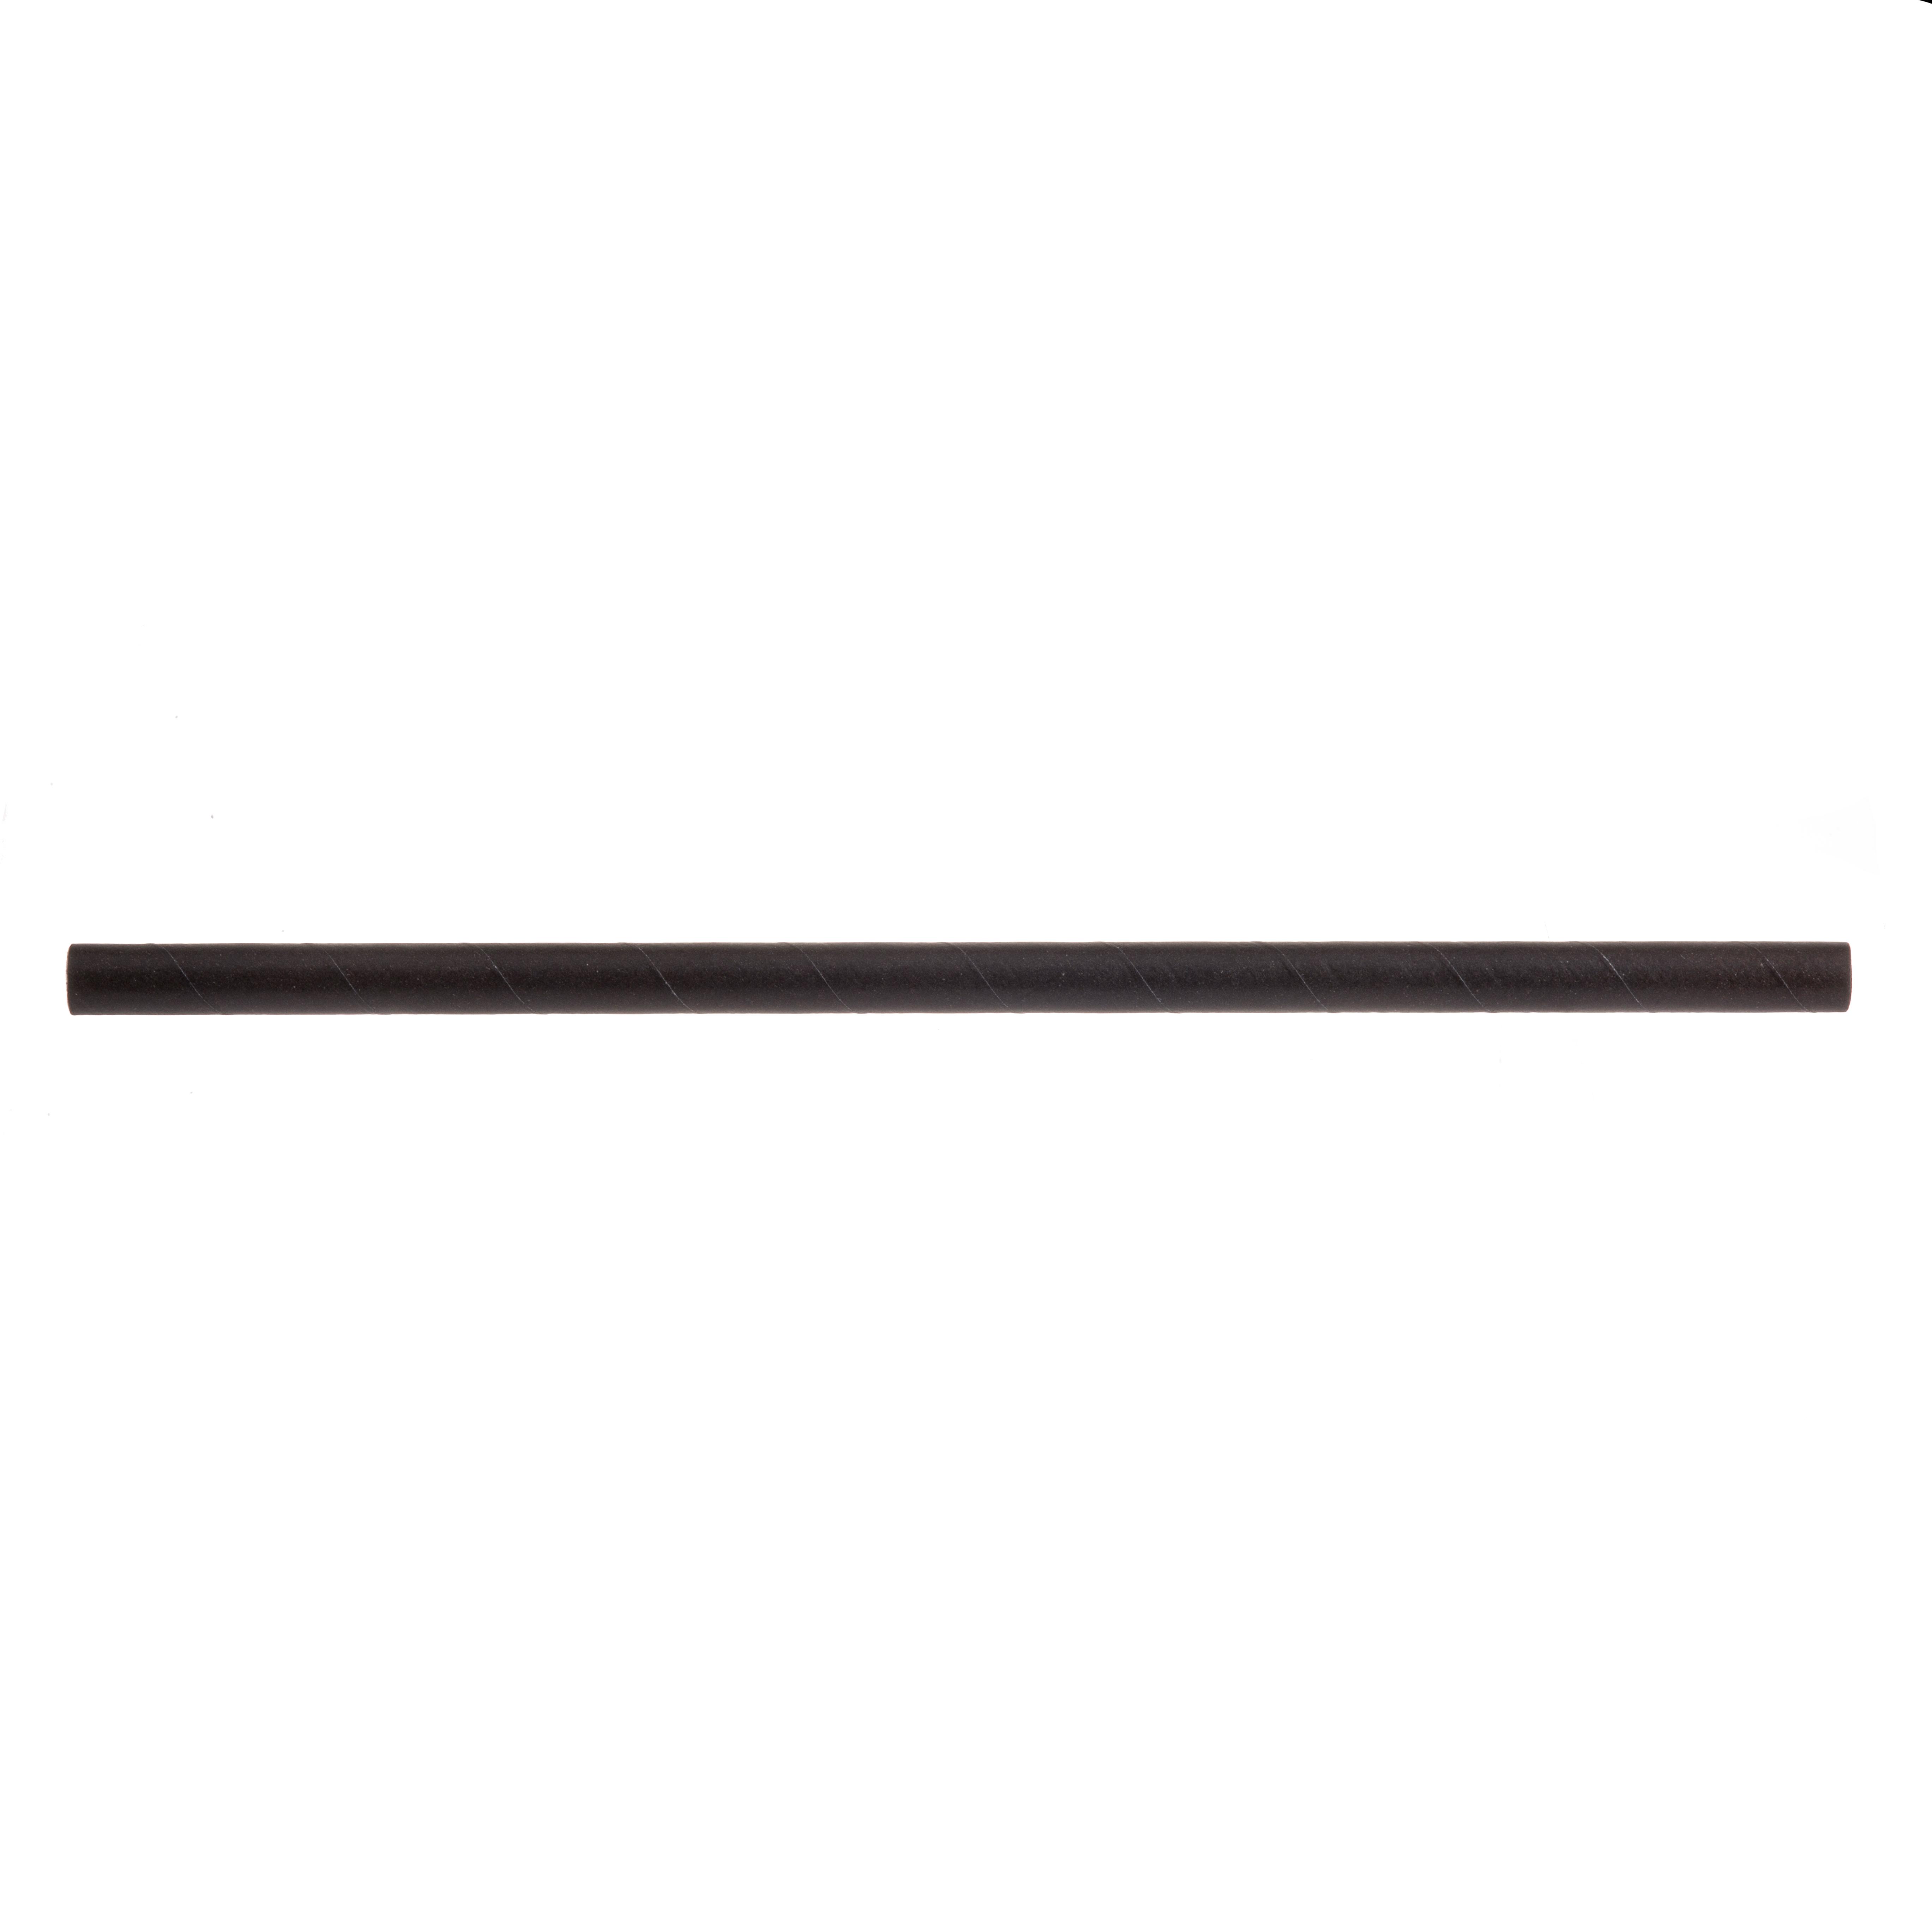 TableCraft Products 700107 straws